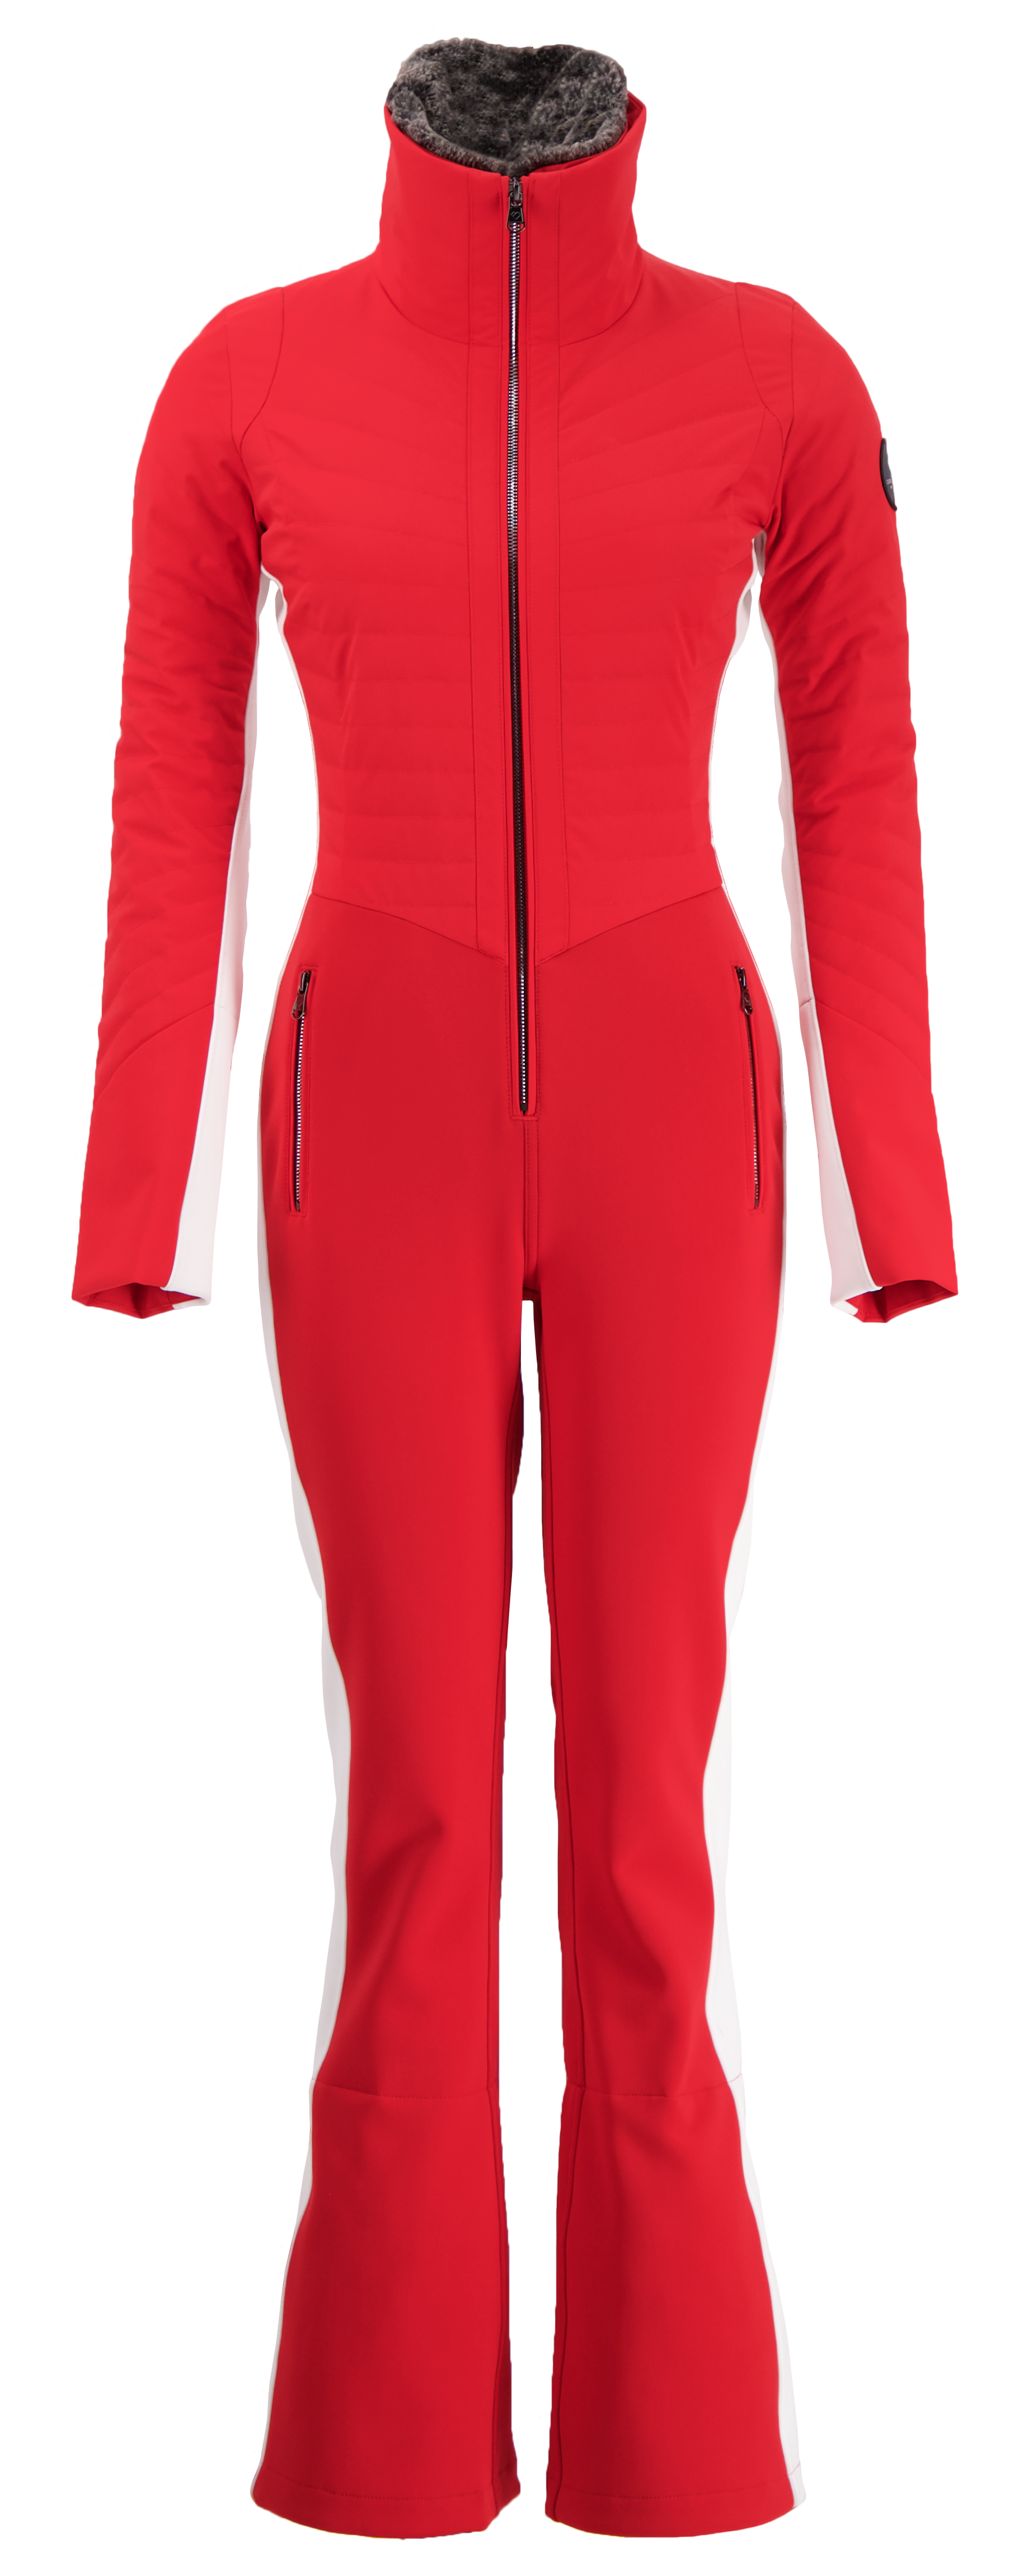 2021 Stöckli Nela 96 Women's All-Mountain Wide Ski thumb